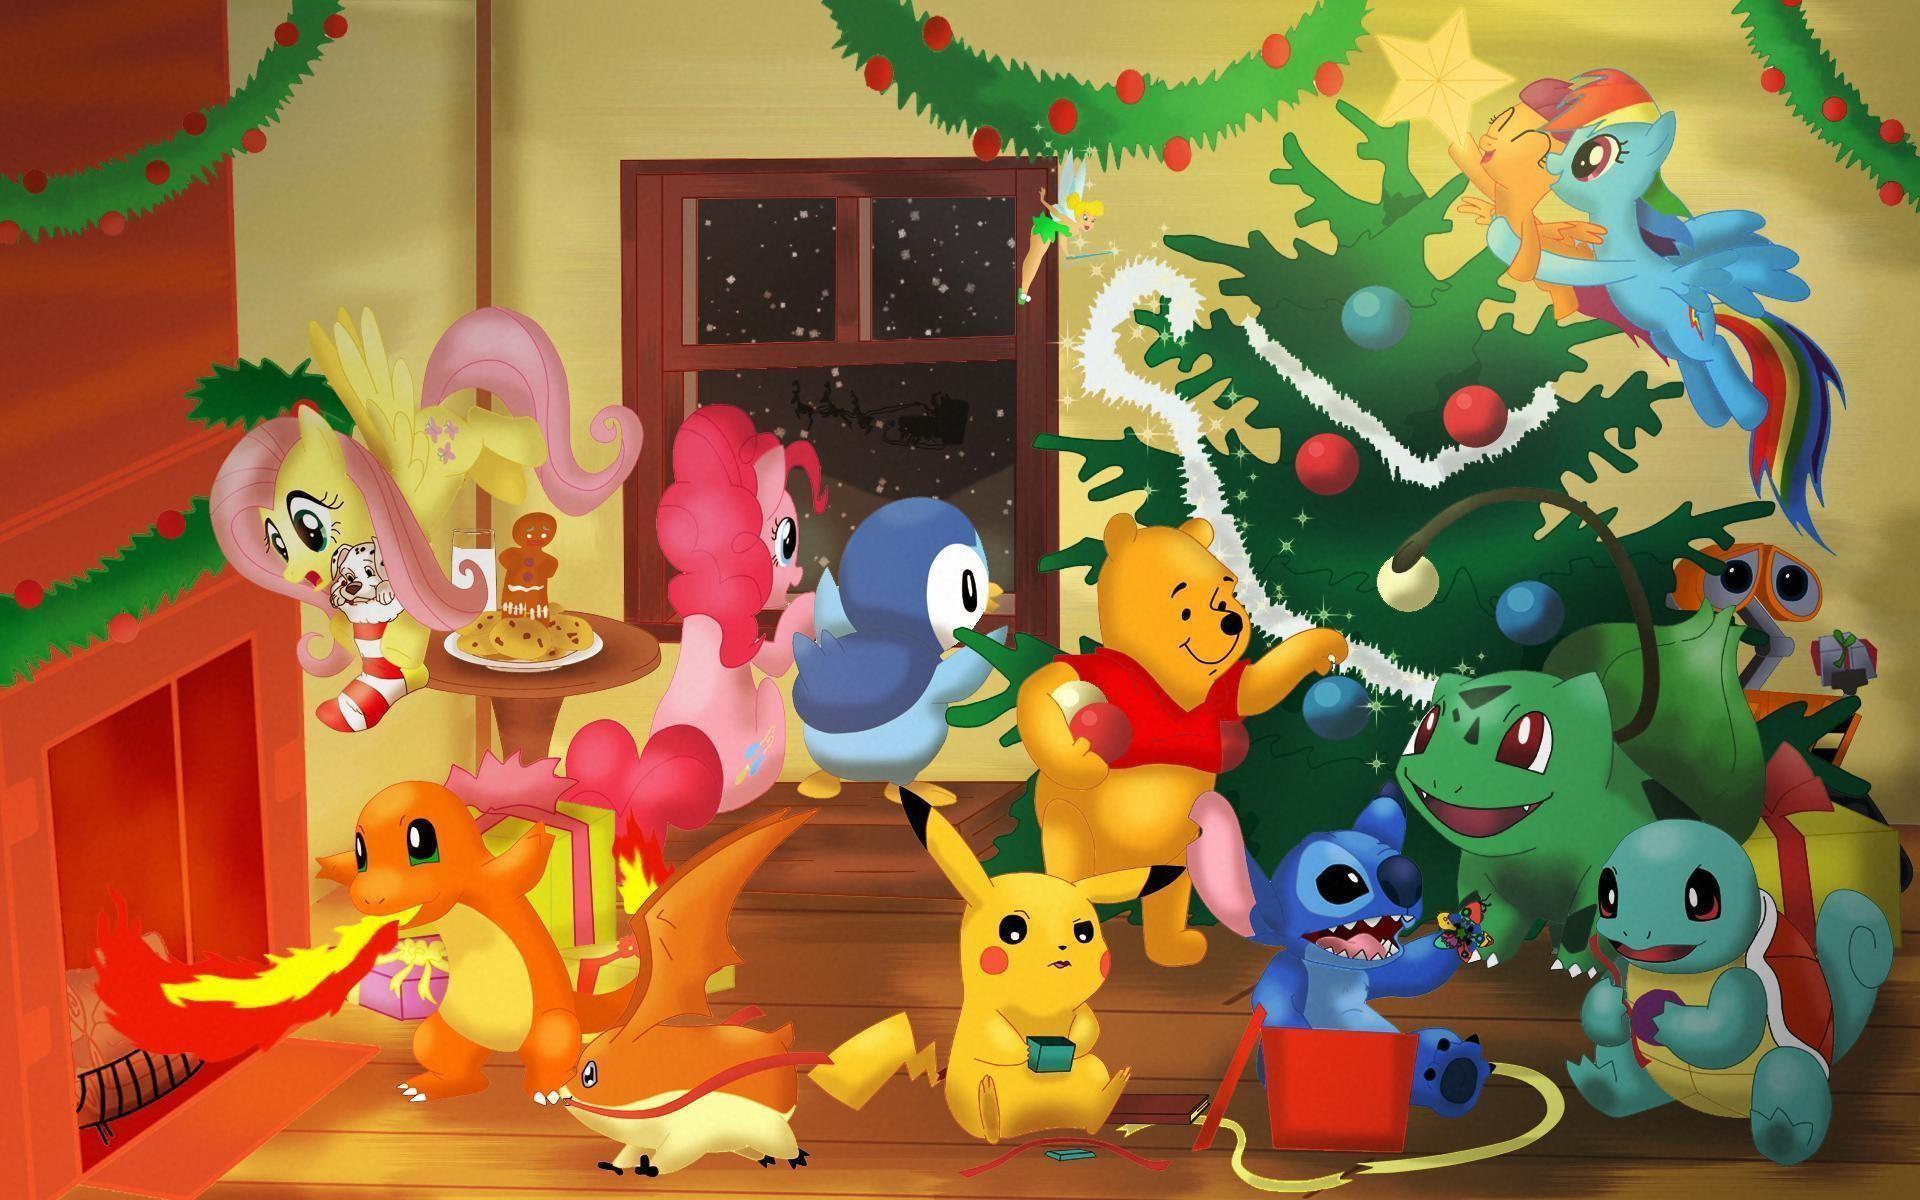 Merry Christmas cartoon charcters Wallpaper #